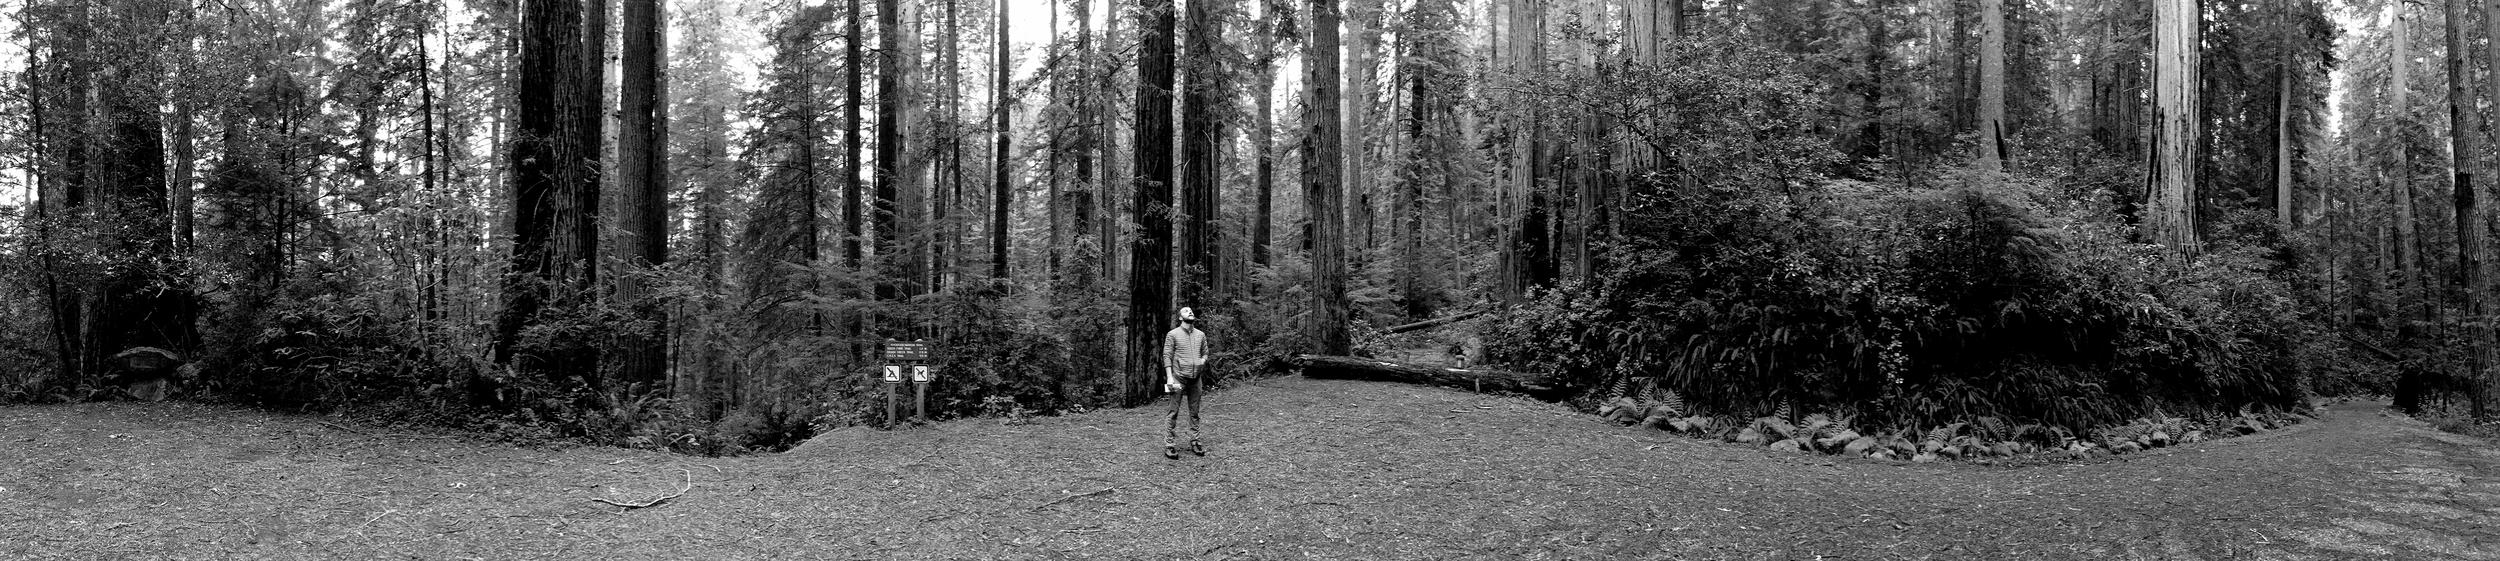 Redwoods-1-b.jpg